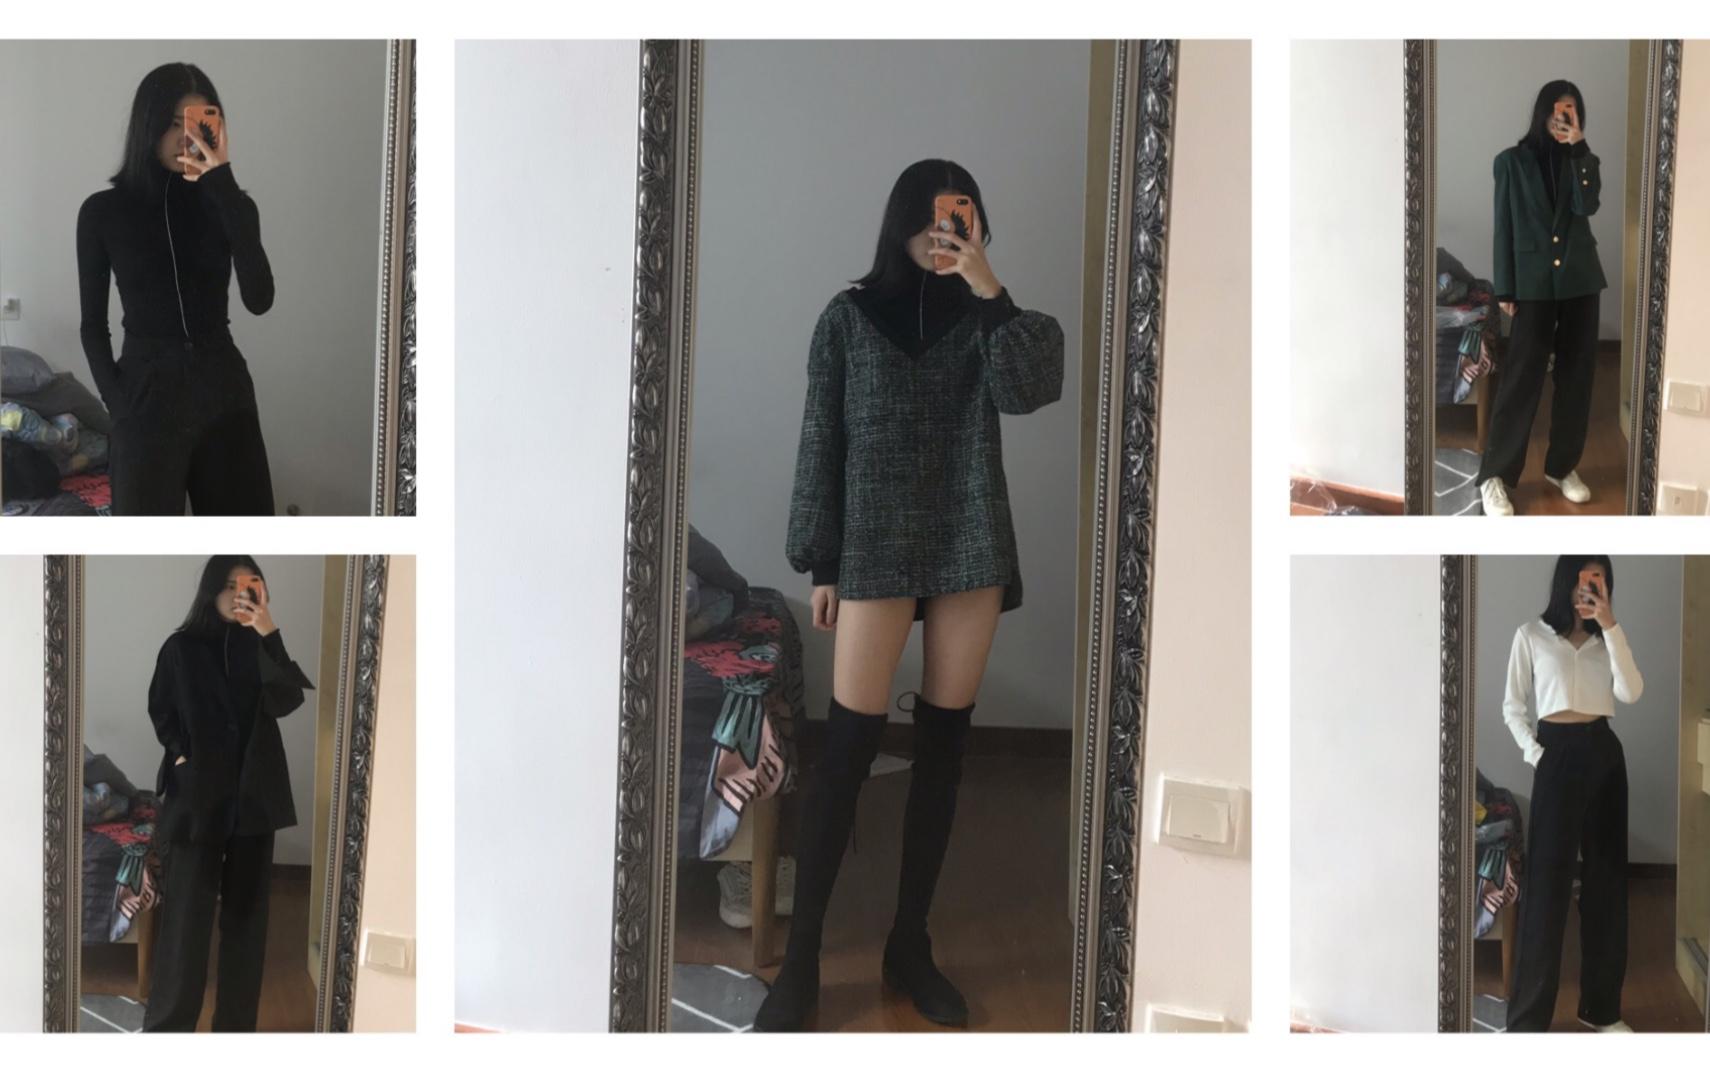 160cm双下巴少女的秋季穿搭分享好物分享及超百搭的鞋子分享_哔哩哔哩 (゜-゜)つロ 干杯~-bilibili